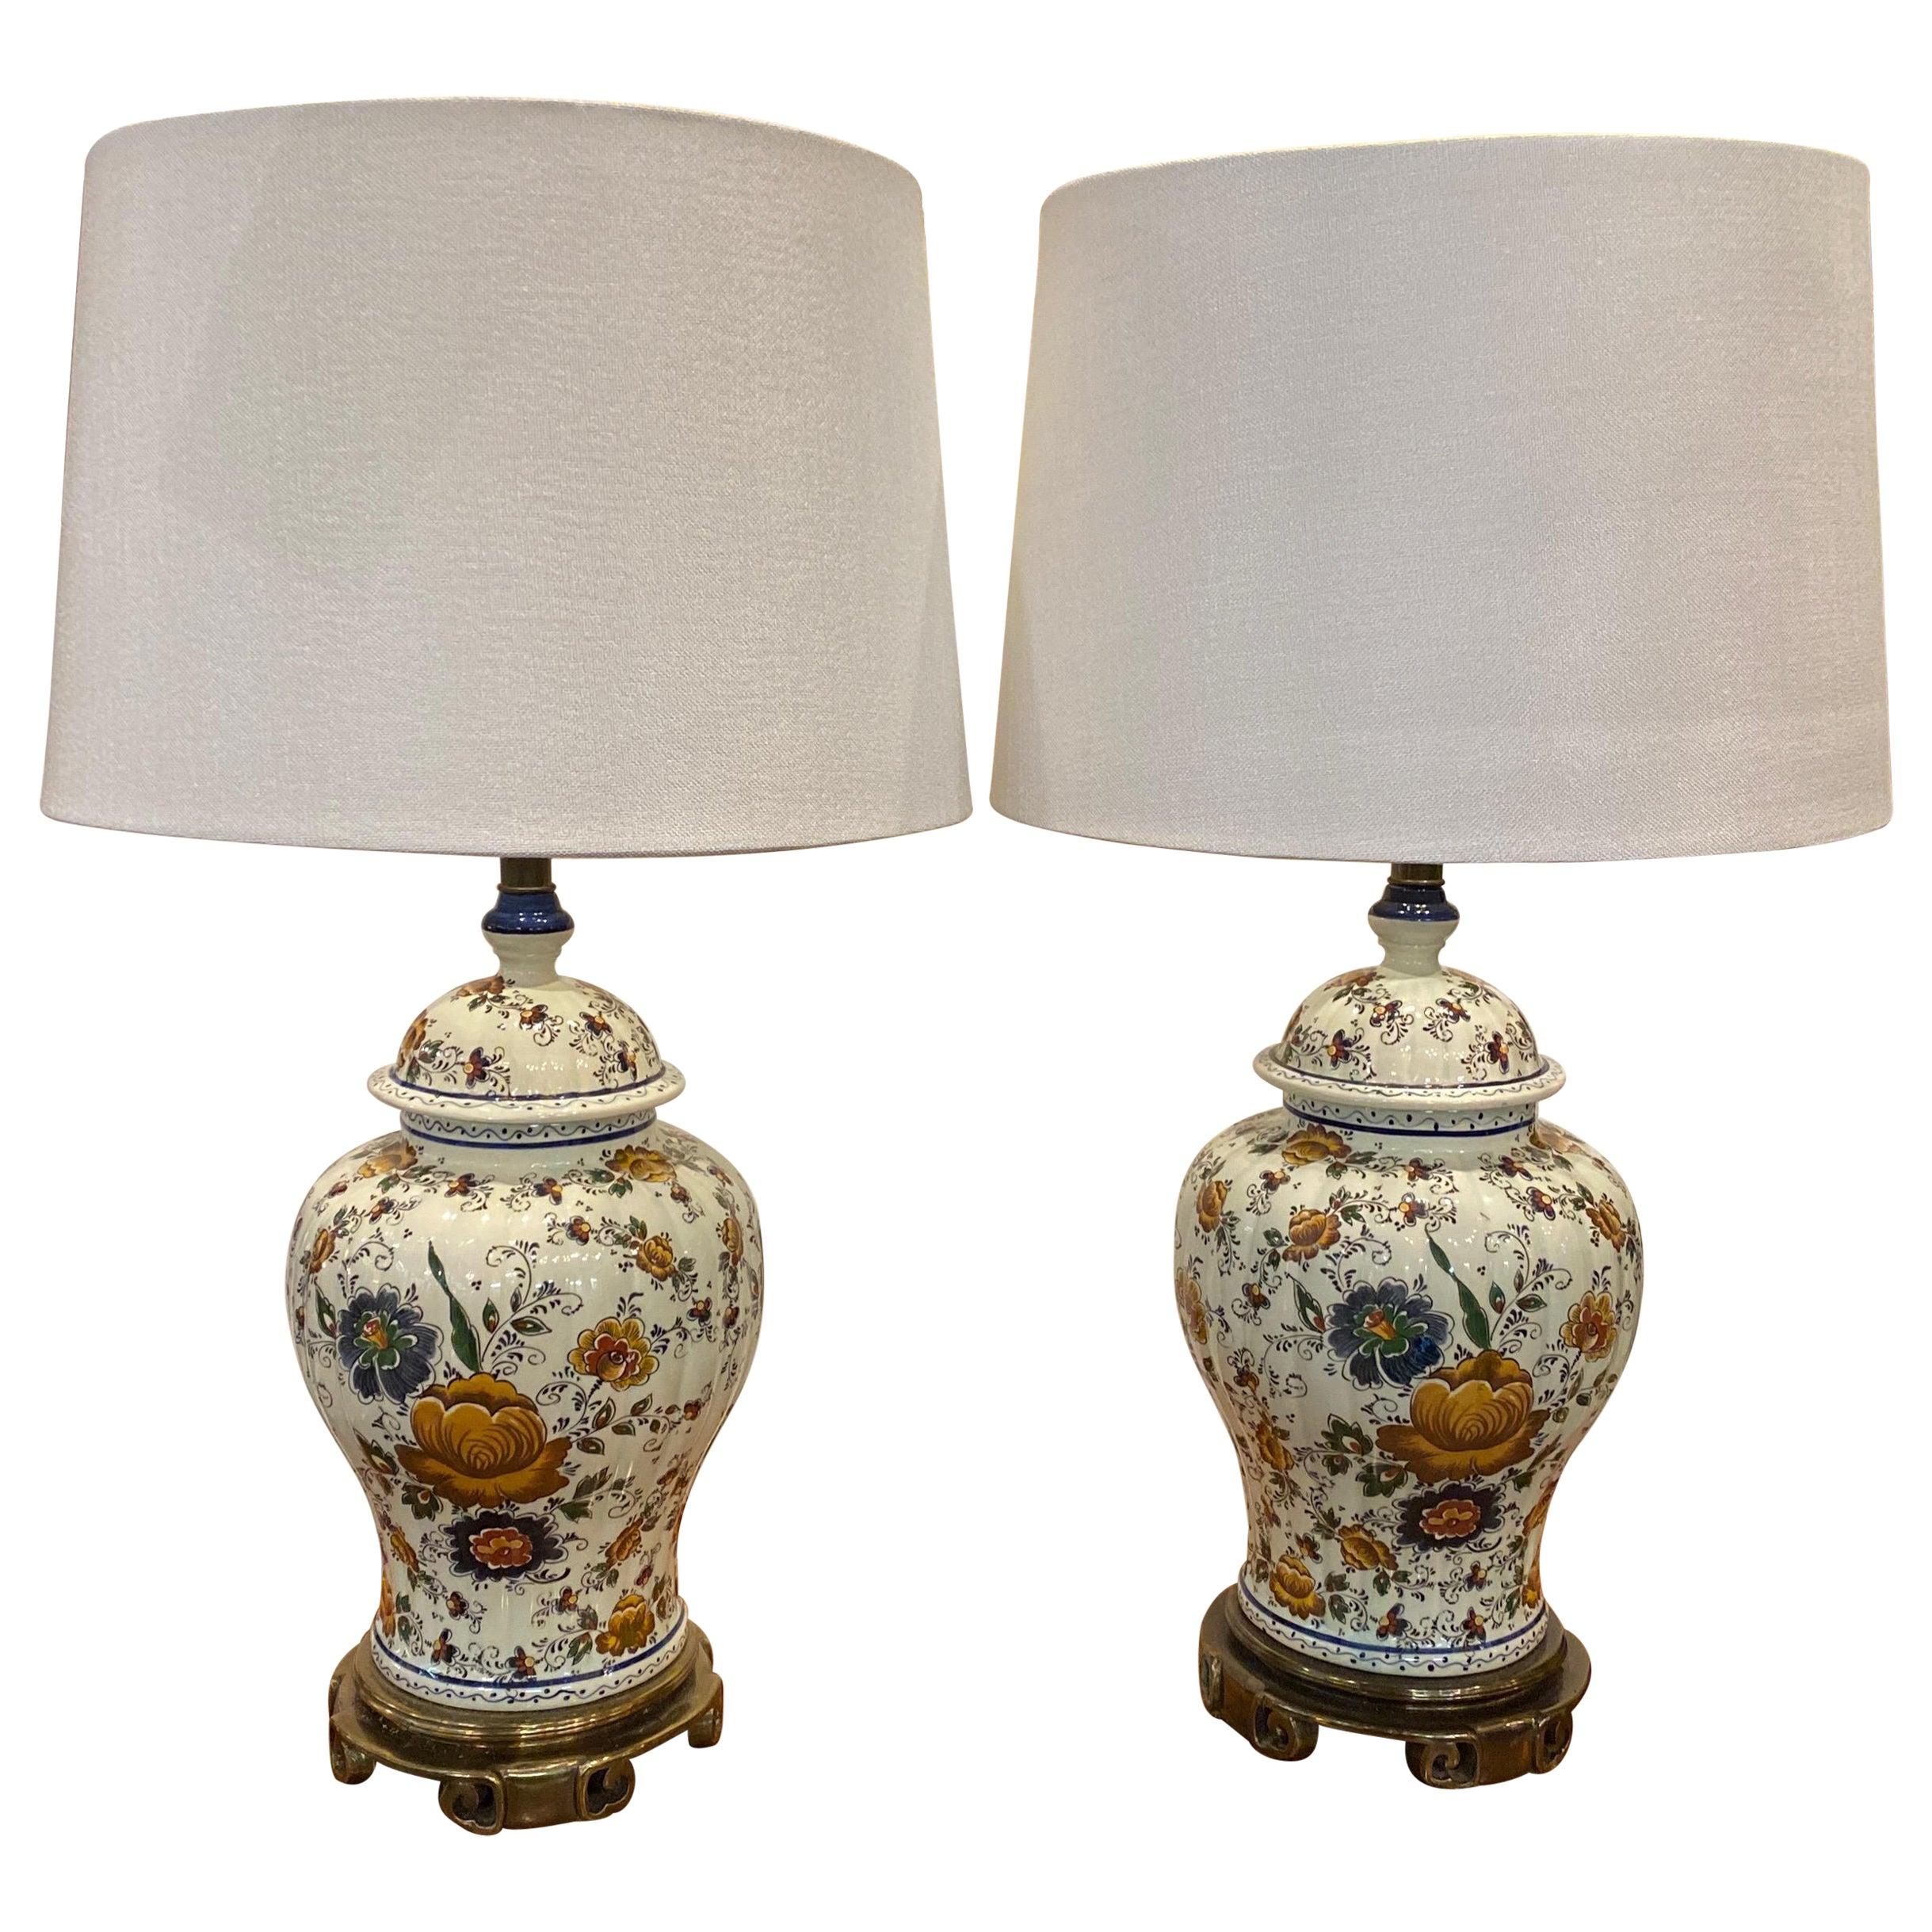 Pair of Delft Ginger Jar Lamps